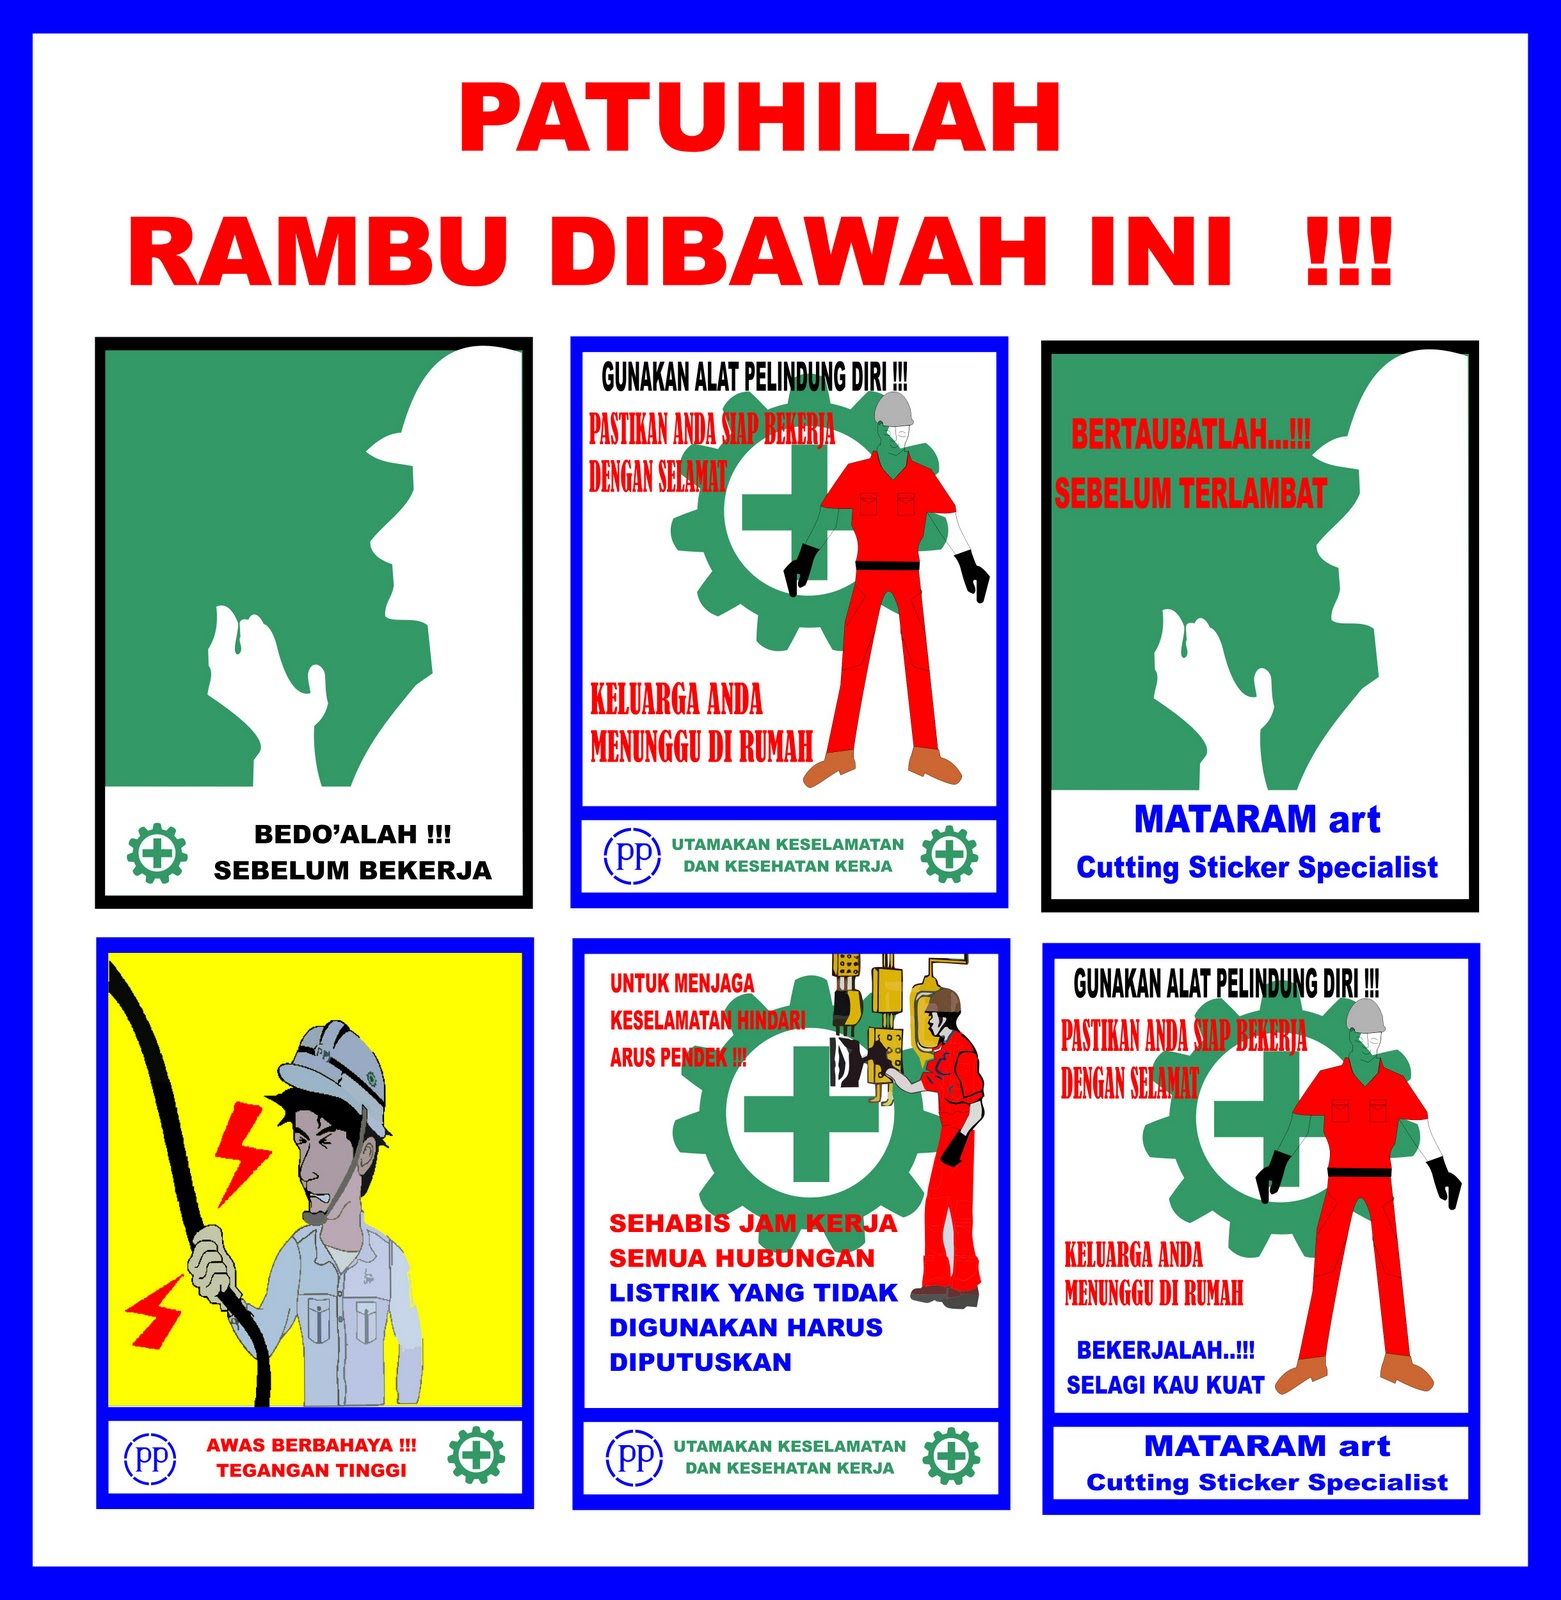 Contoh Gambar Poster K3 - Feed News Indonesia